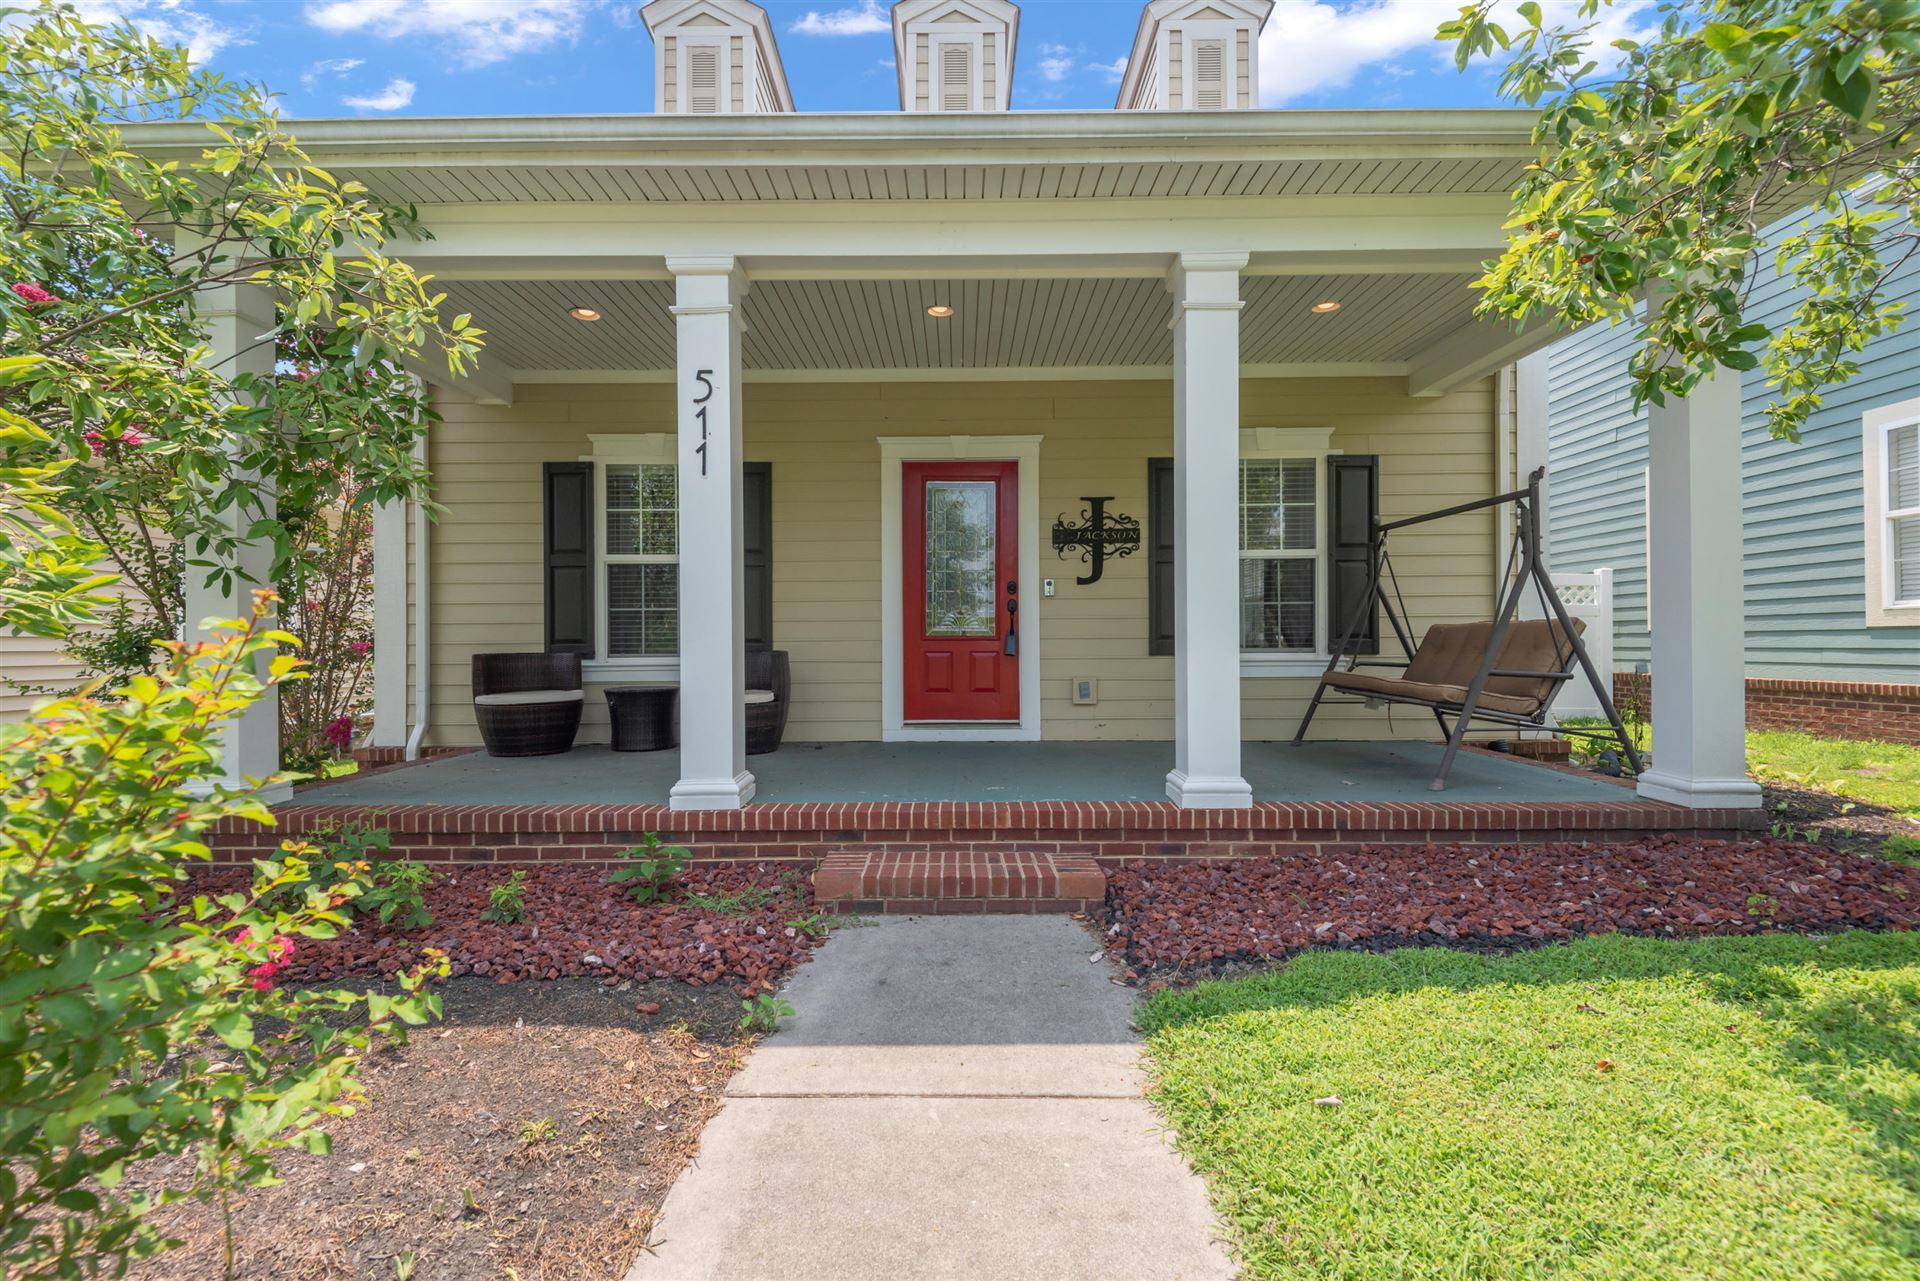 Photo of 511 Broadberry Ave, Oak Ridge, TN 37830 (MLS # 1161453)